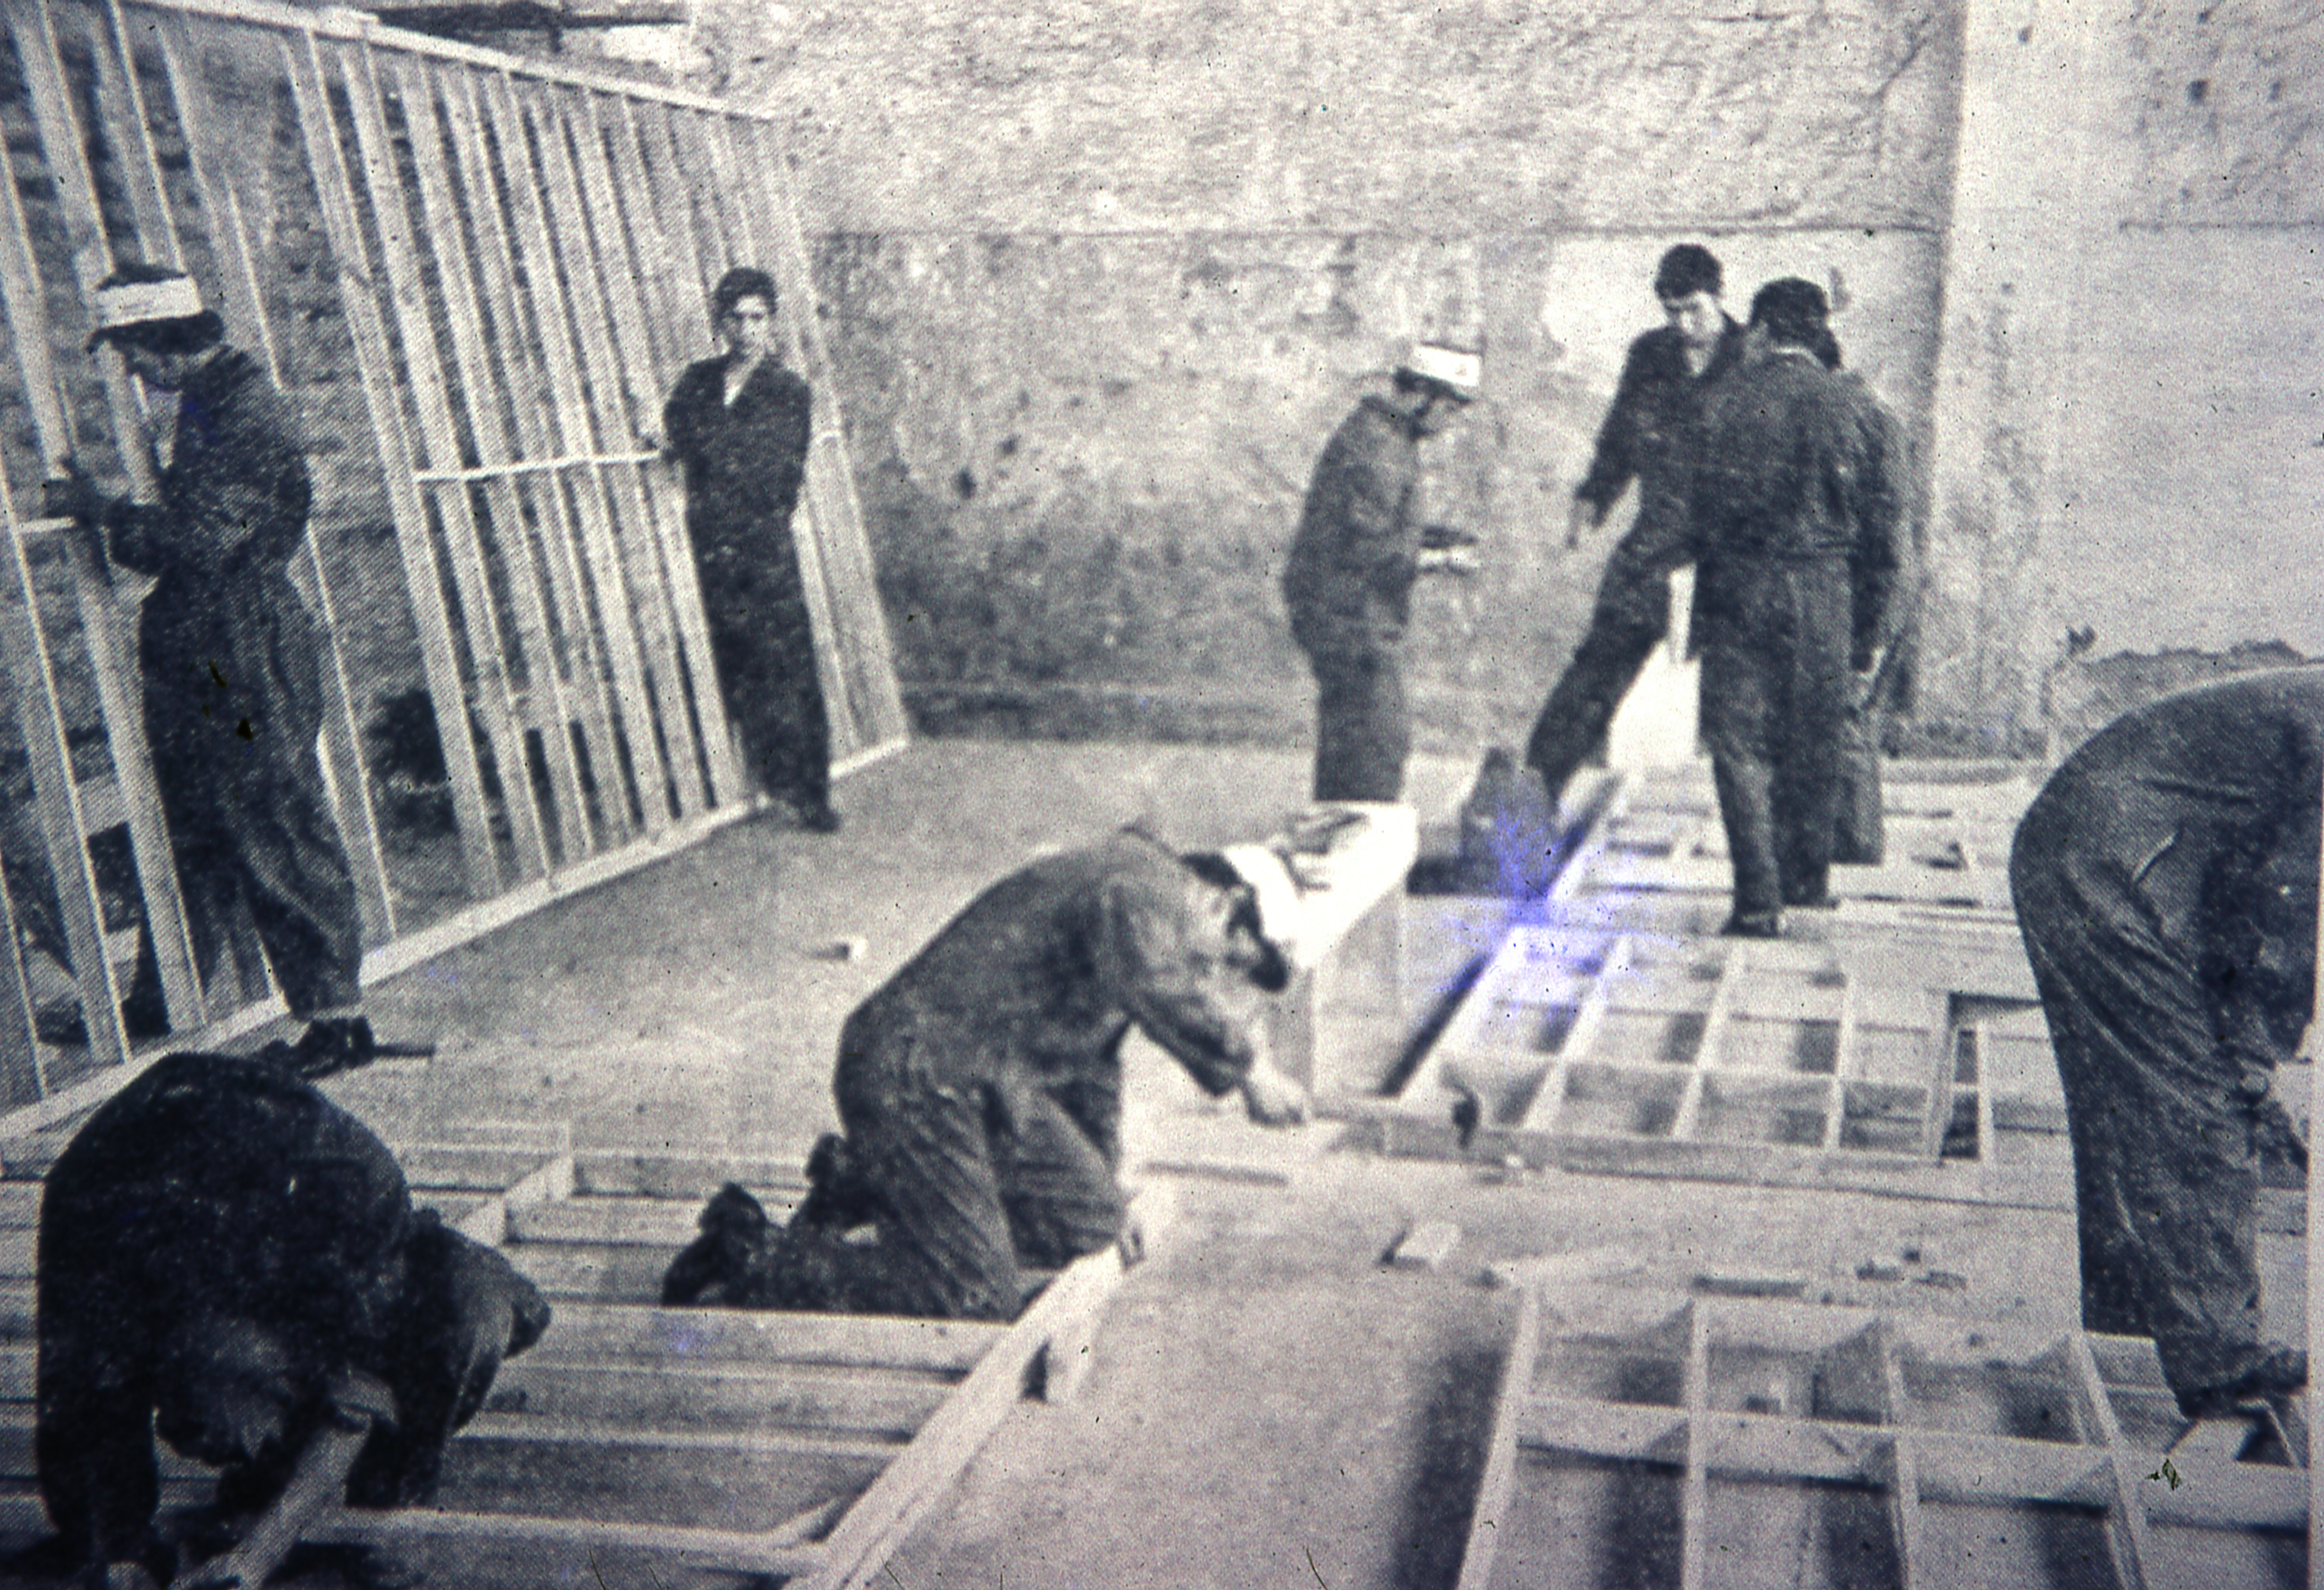 Enterreno - Fotos históricas de chile - fotos antiguas de Chile - Paneles Inacap, 1977